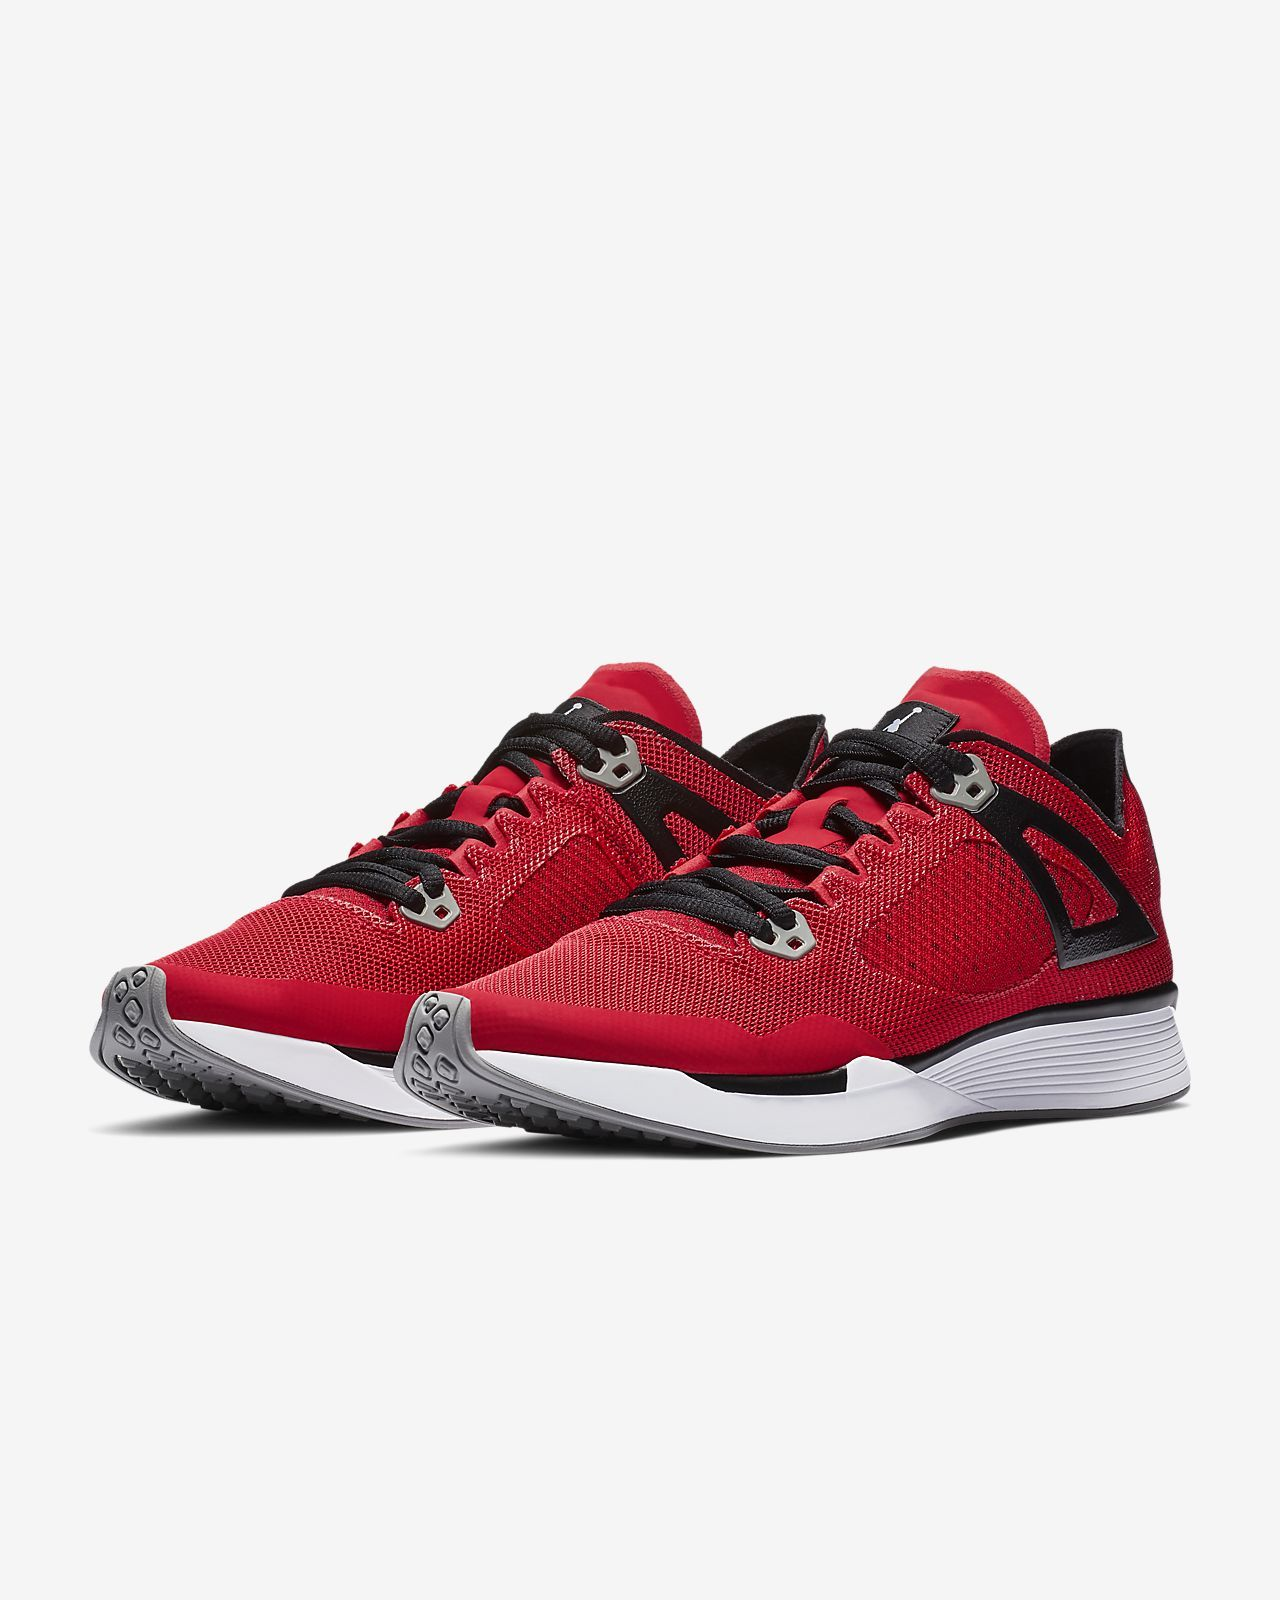 f5b98ebdc71 Jordan 89 Racer Men's Training Shoe in 2019 | Fashion 時裝 | Mens ...